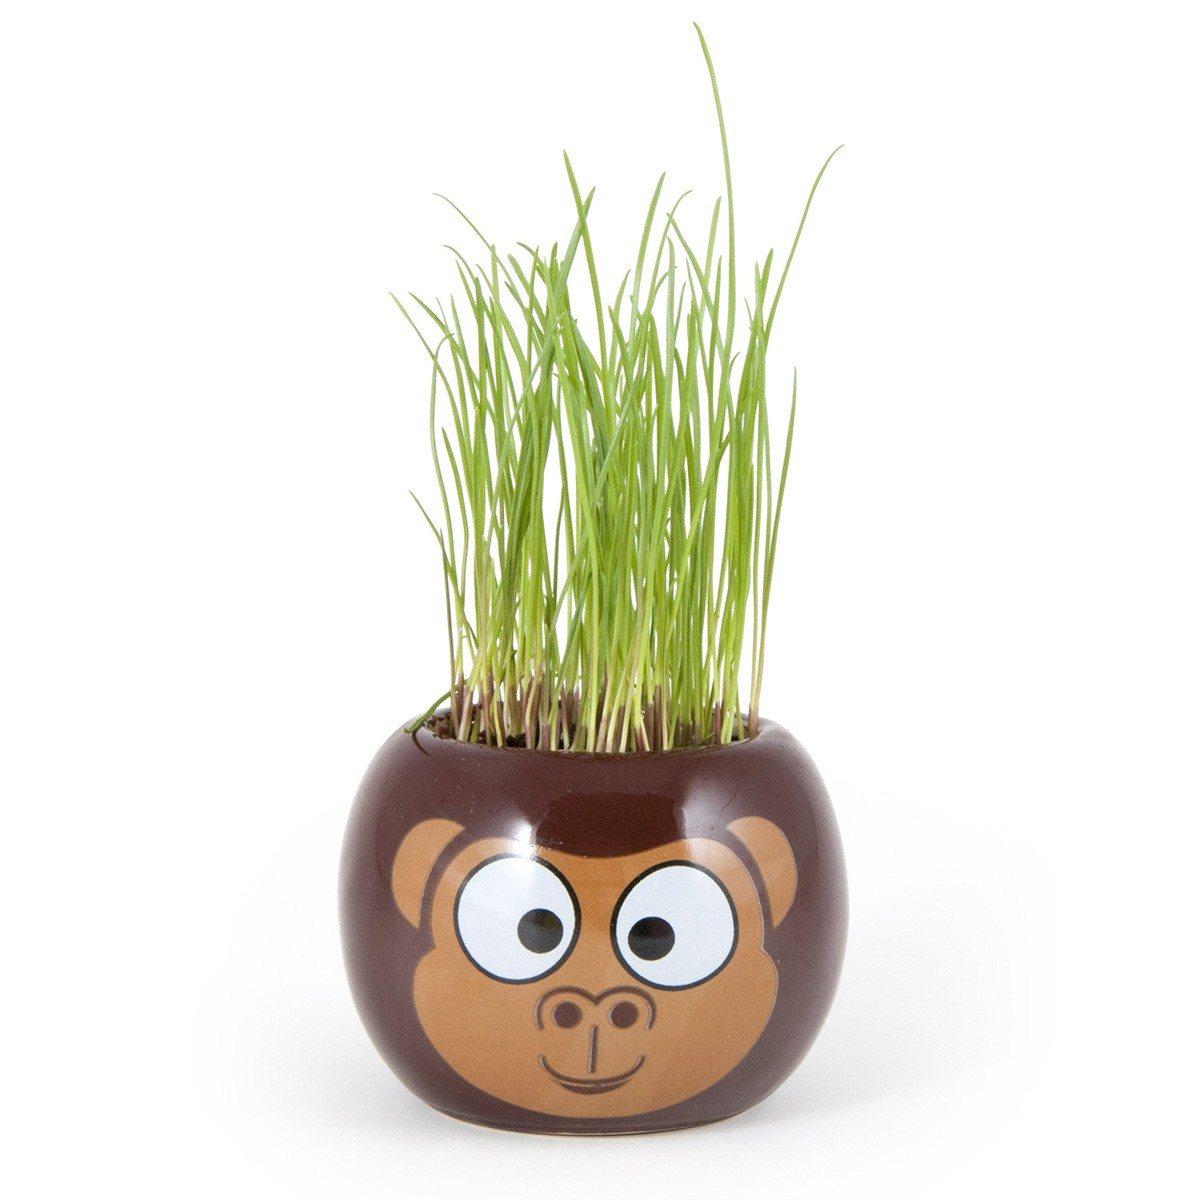 Klein plantje met dierenafbeelding